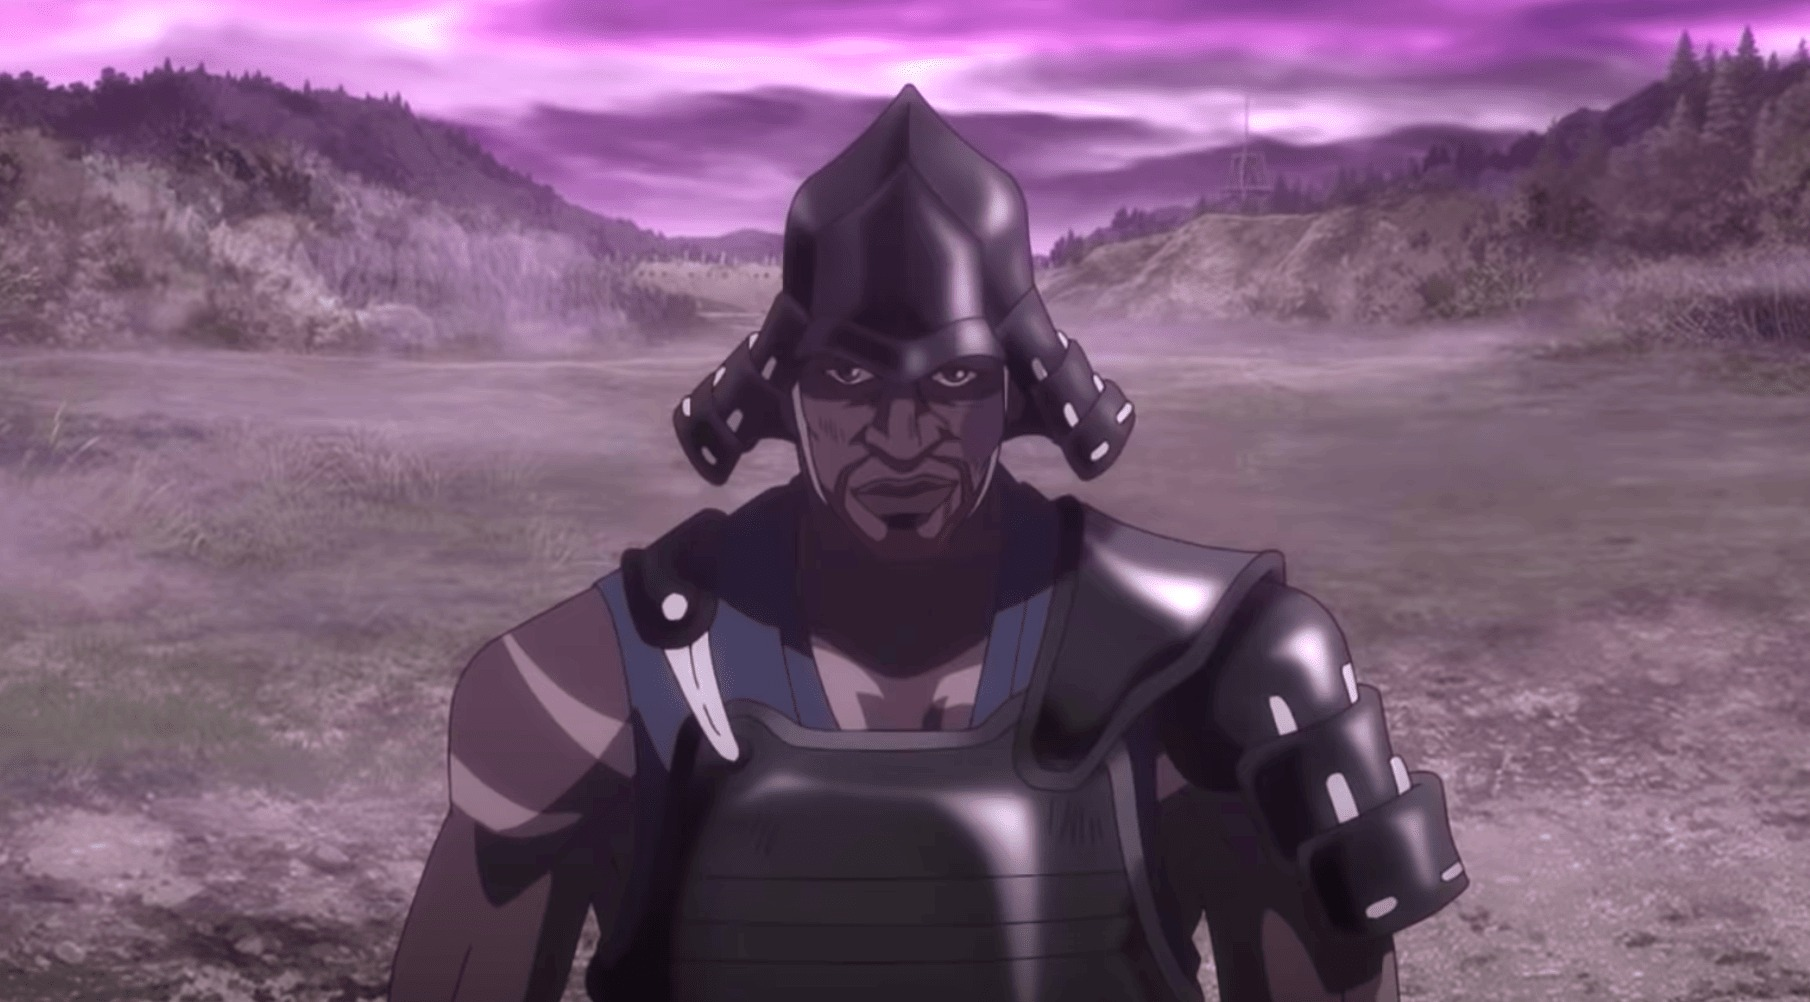 LaKeith Stanfield Is The First Black Samurai In Netflix Anime Series 'Yasuke'